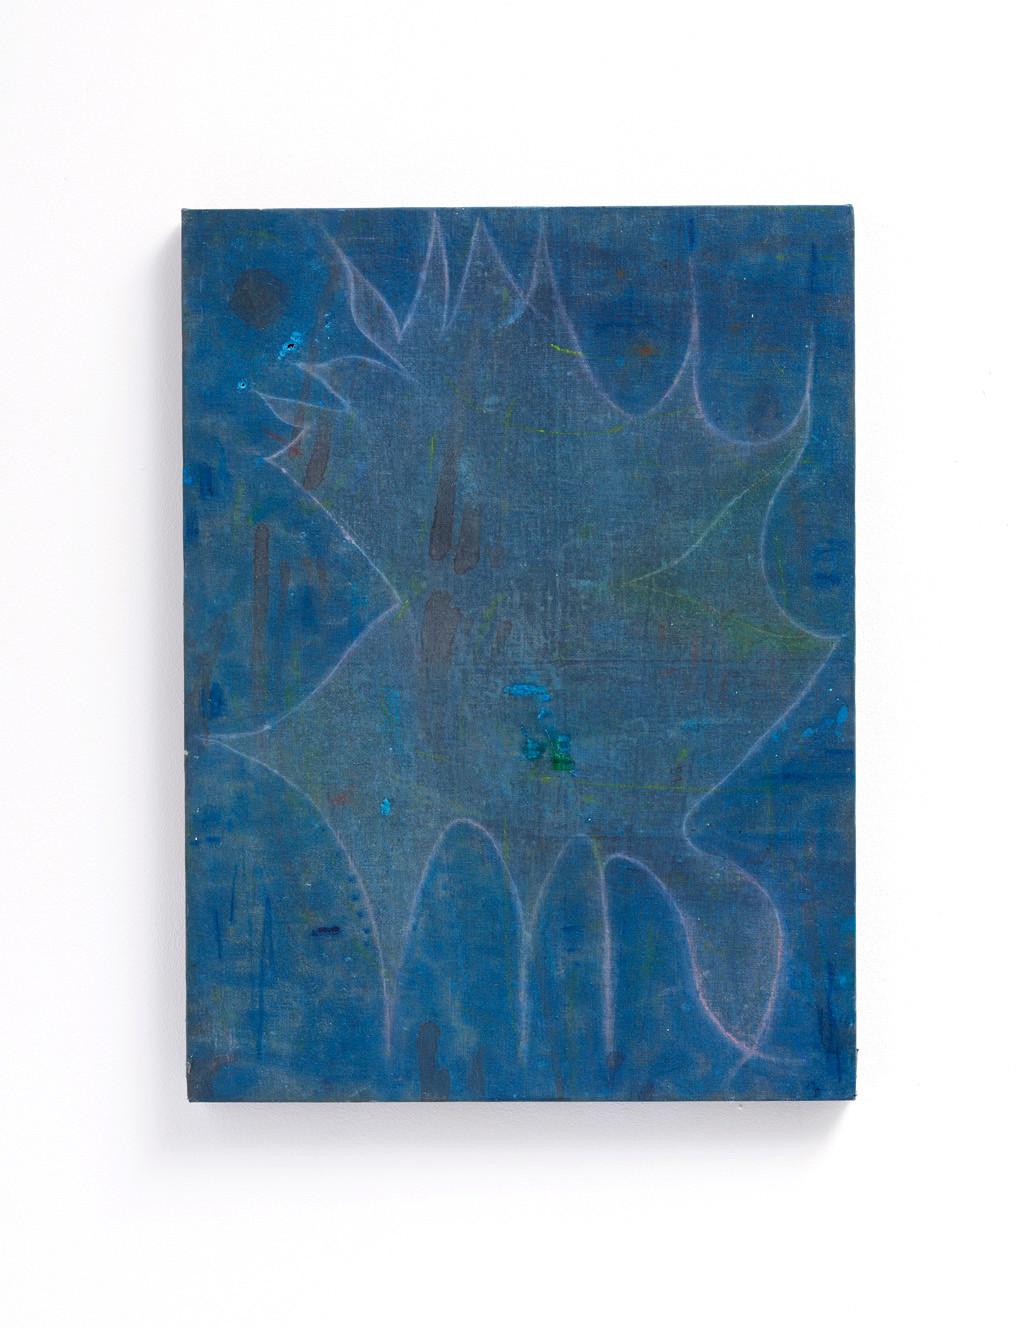 ~ an unfinished extension. 2015-18. oil paint, pastel on linen. 60.5 x 45.5 cm